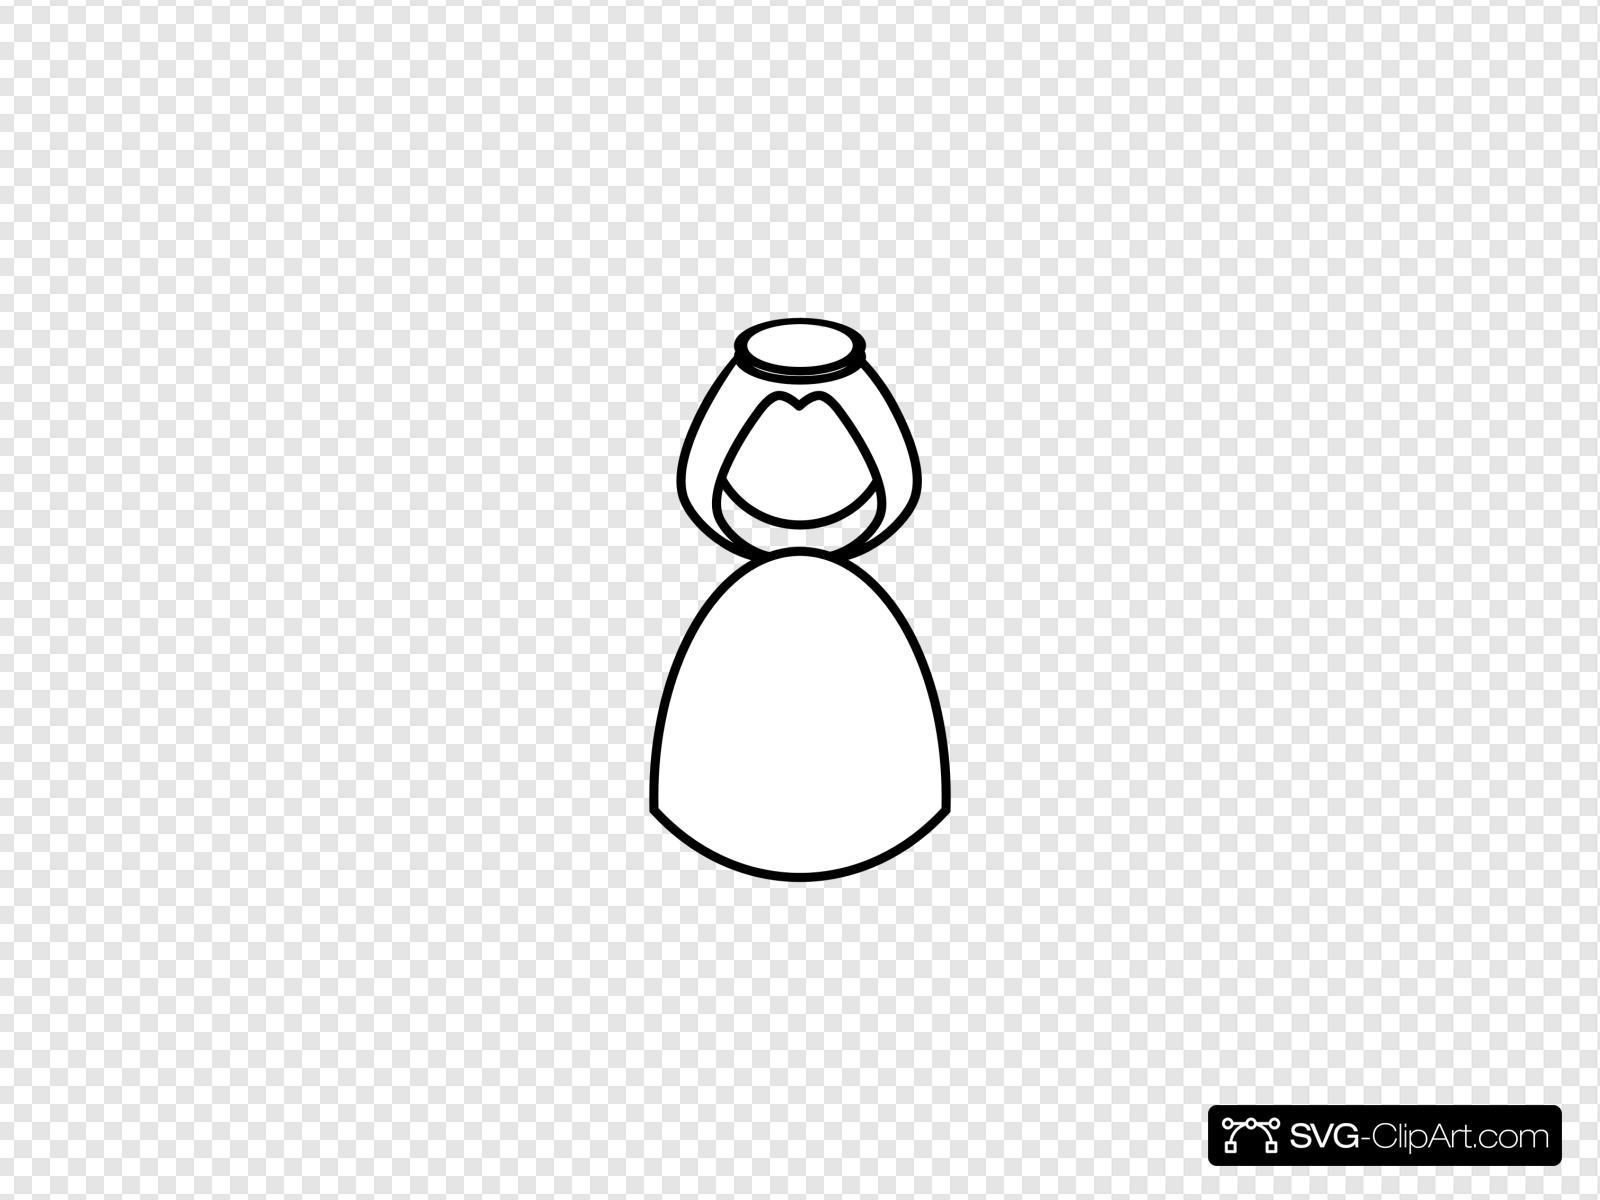 Gcc clipart vector stock Person Gcc Man Clip art, Icon and SVG - SVG Clipart vector stock